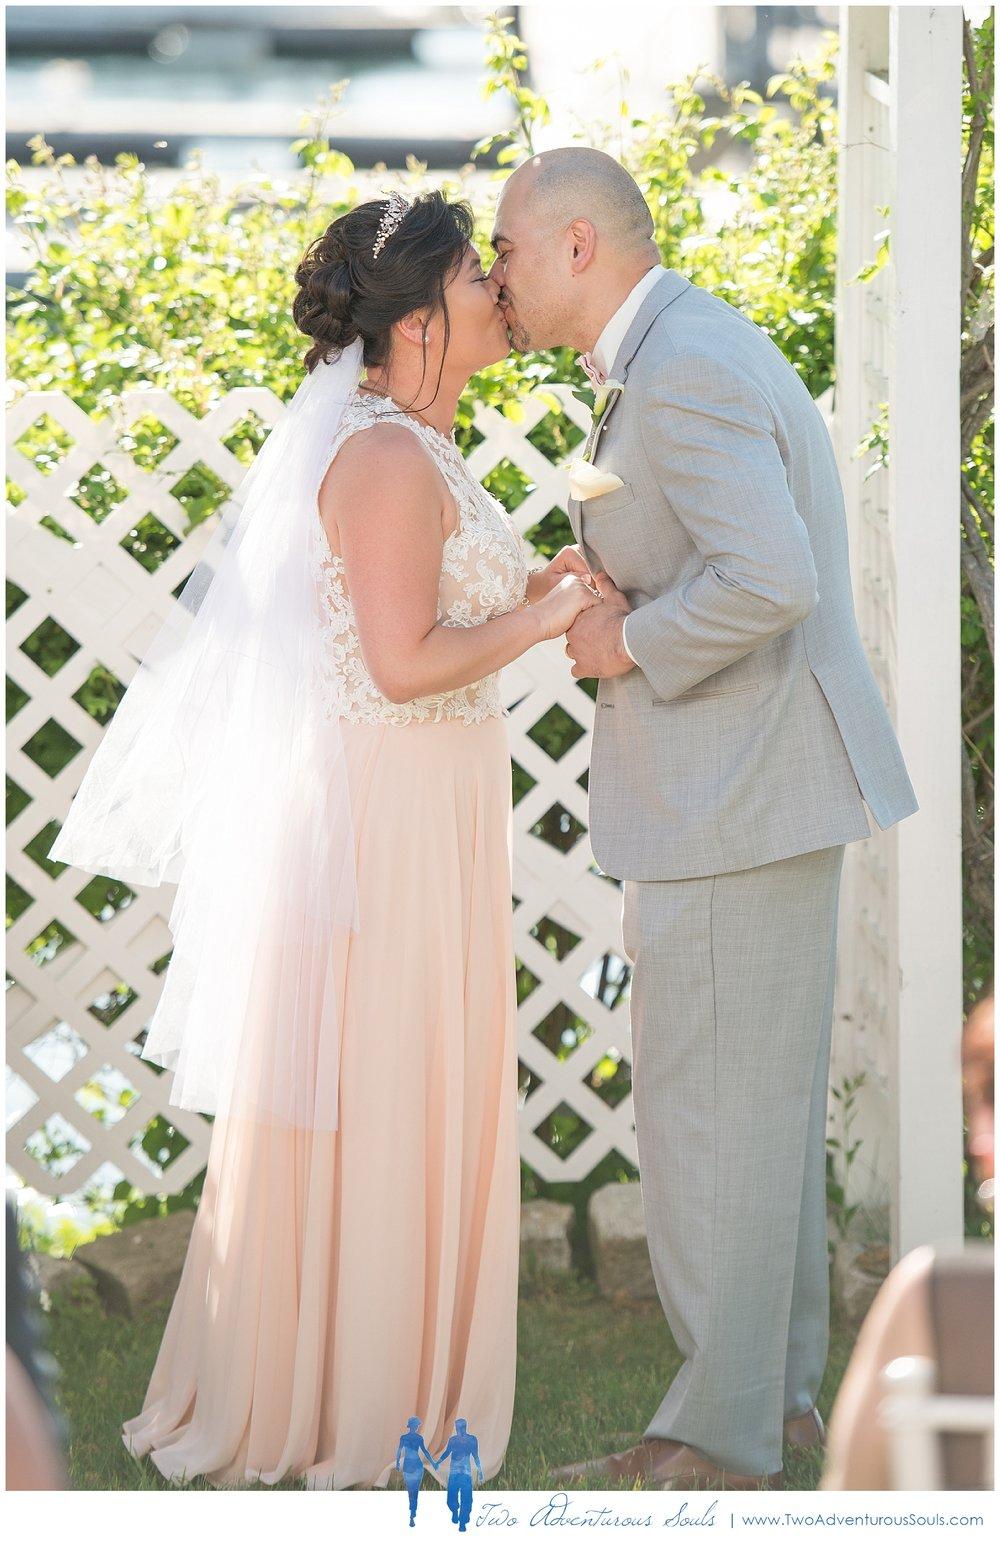 Harborview at Jones Landing Wedding by Maine Wedding Photographers - Peaks Island Wedding - 26